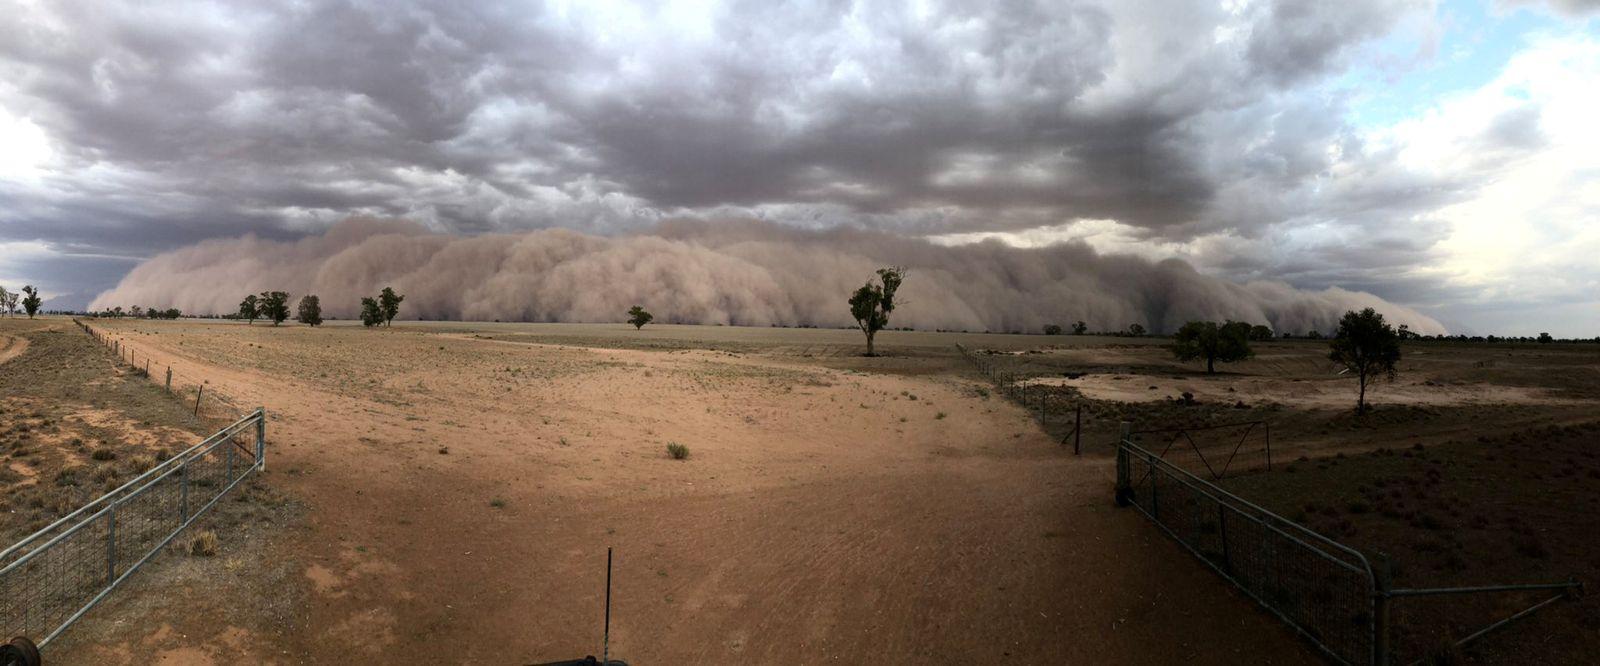 A duststorm approaches a farm, northwest of Dubbo, Australia